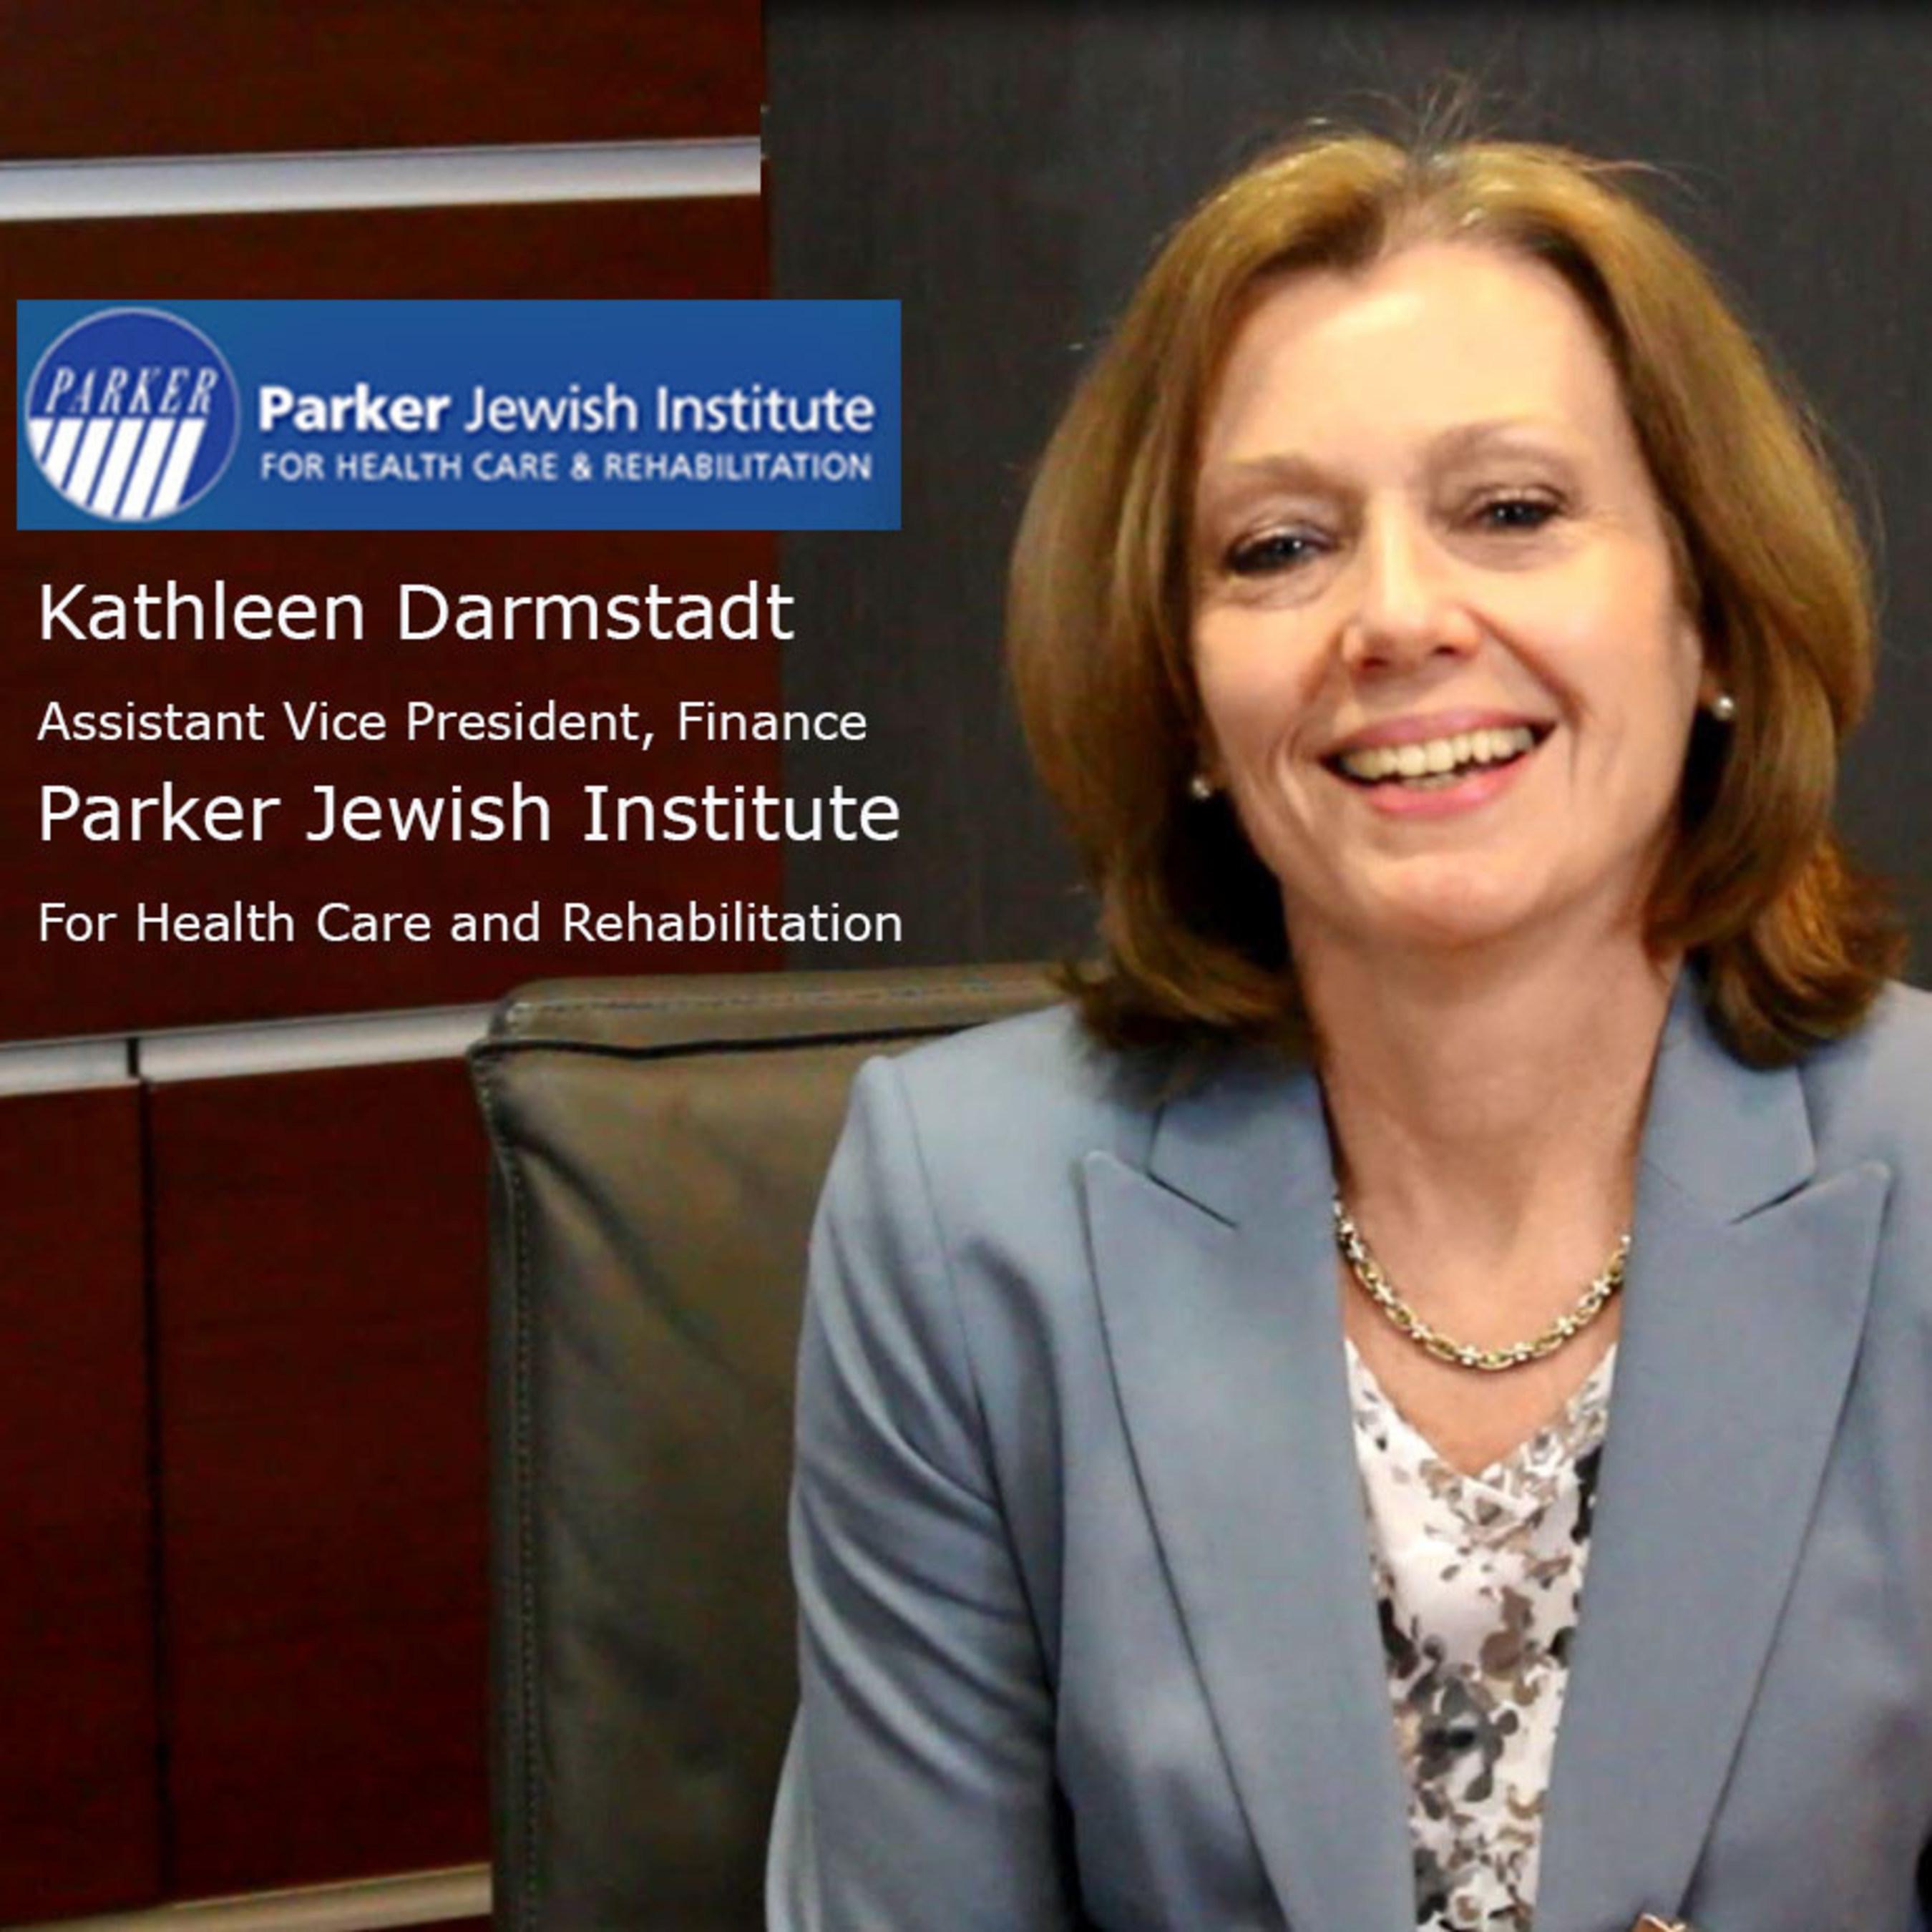 Kathleen Darmstadt, AVP Finance, Parker Jewish Institute for Health Care and Rehabilitation